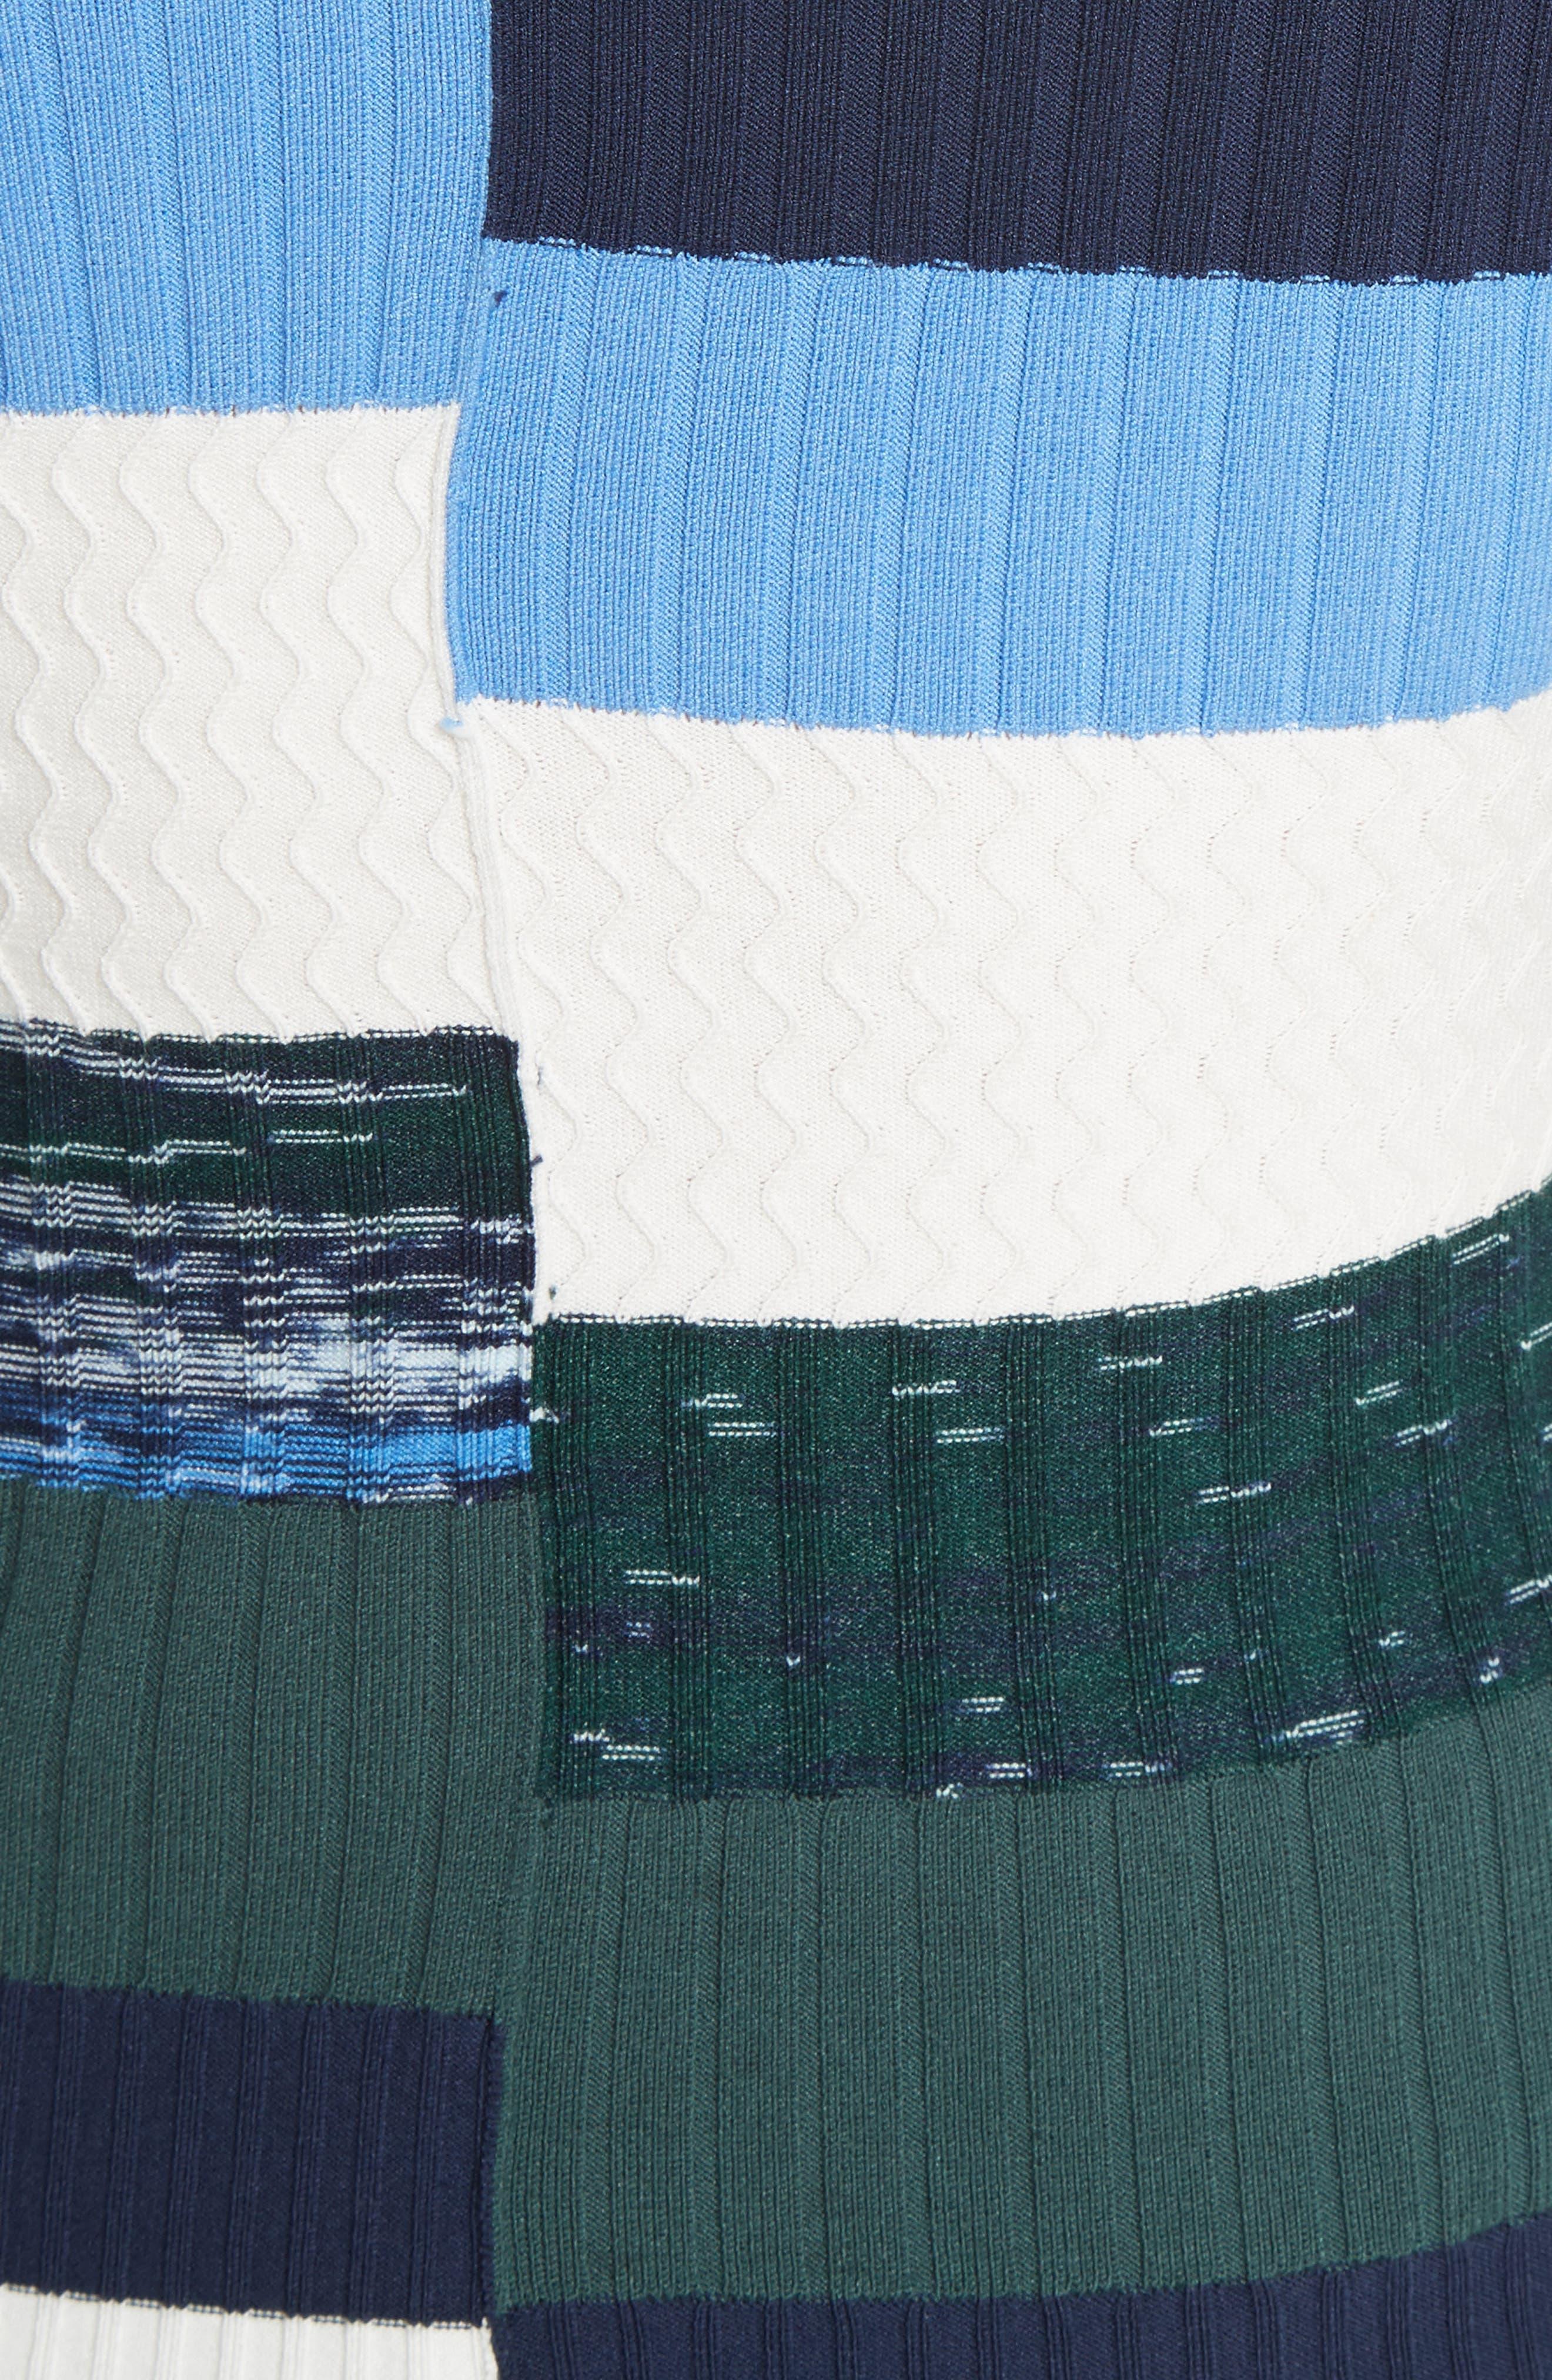 Space Dye Stripe Top,                             Alternate thumbnail 5, color,                             Eclipse Multi